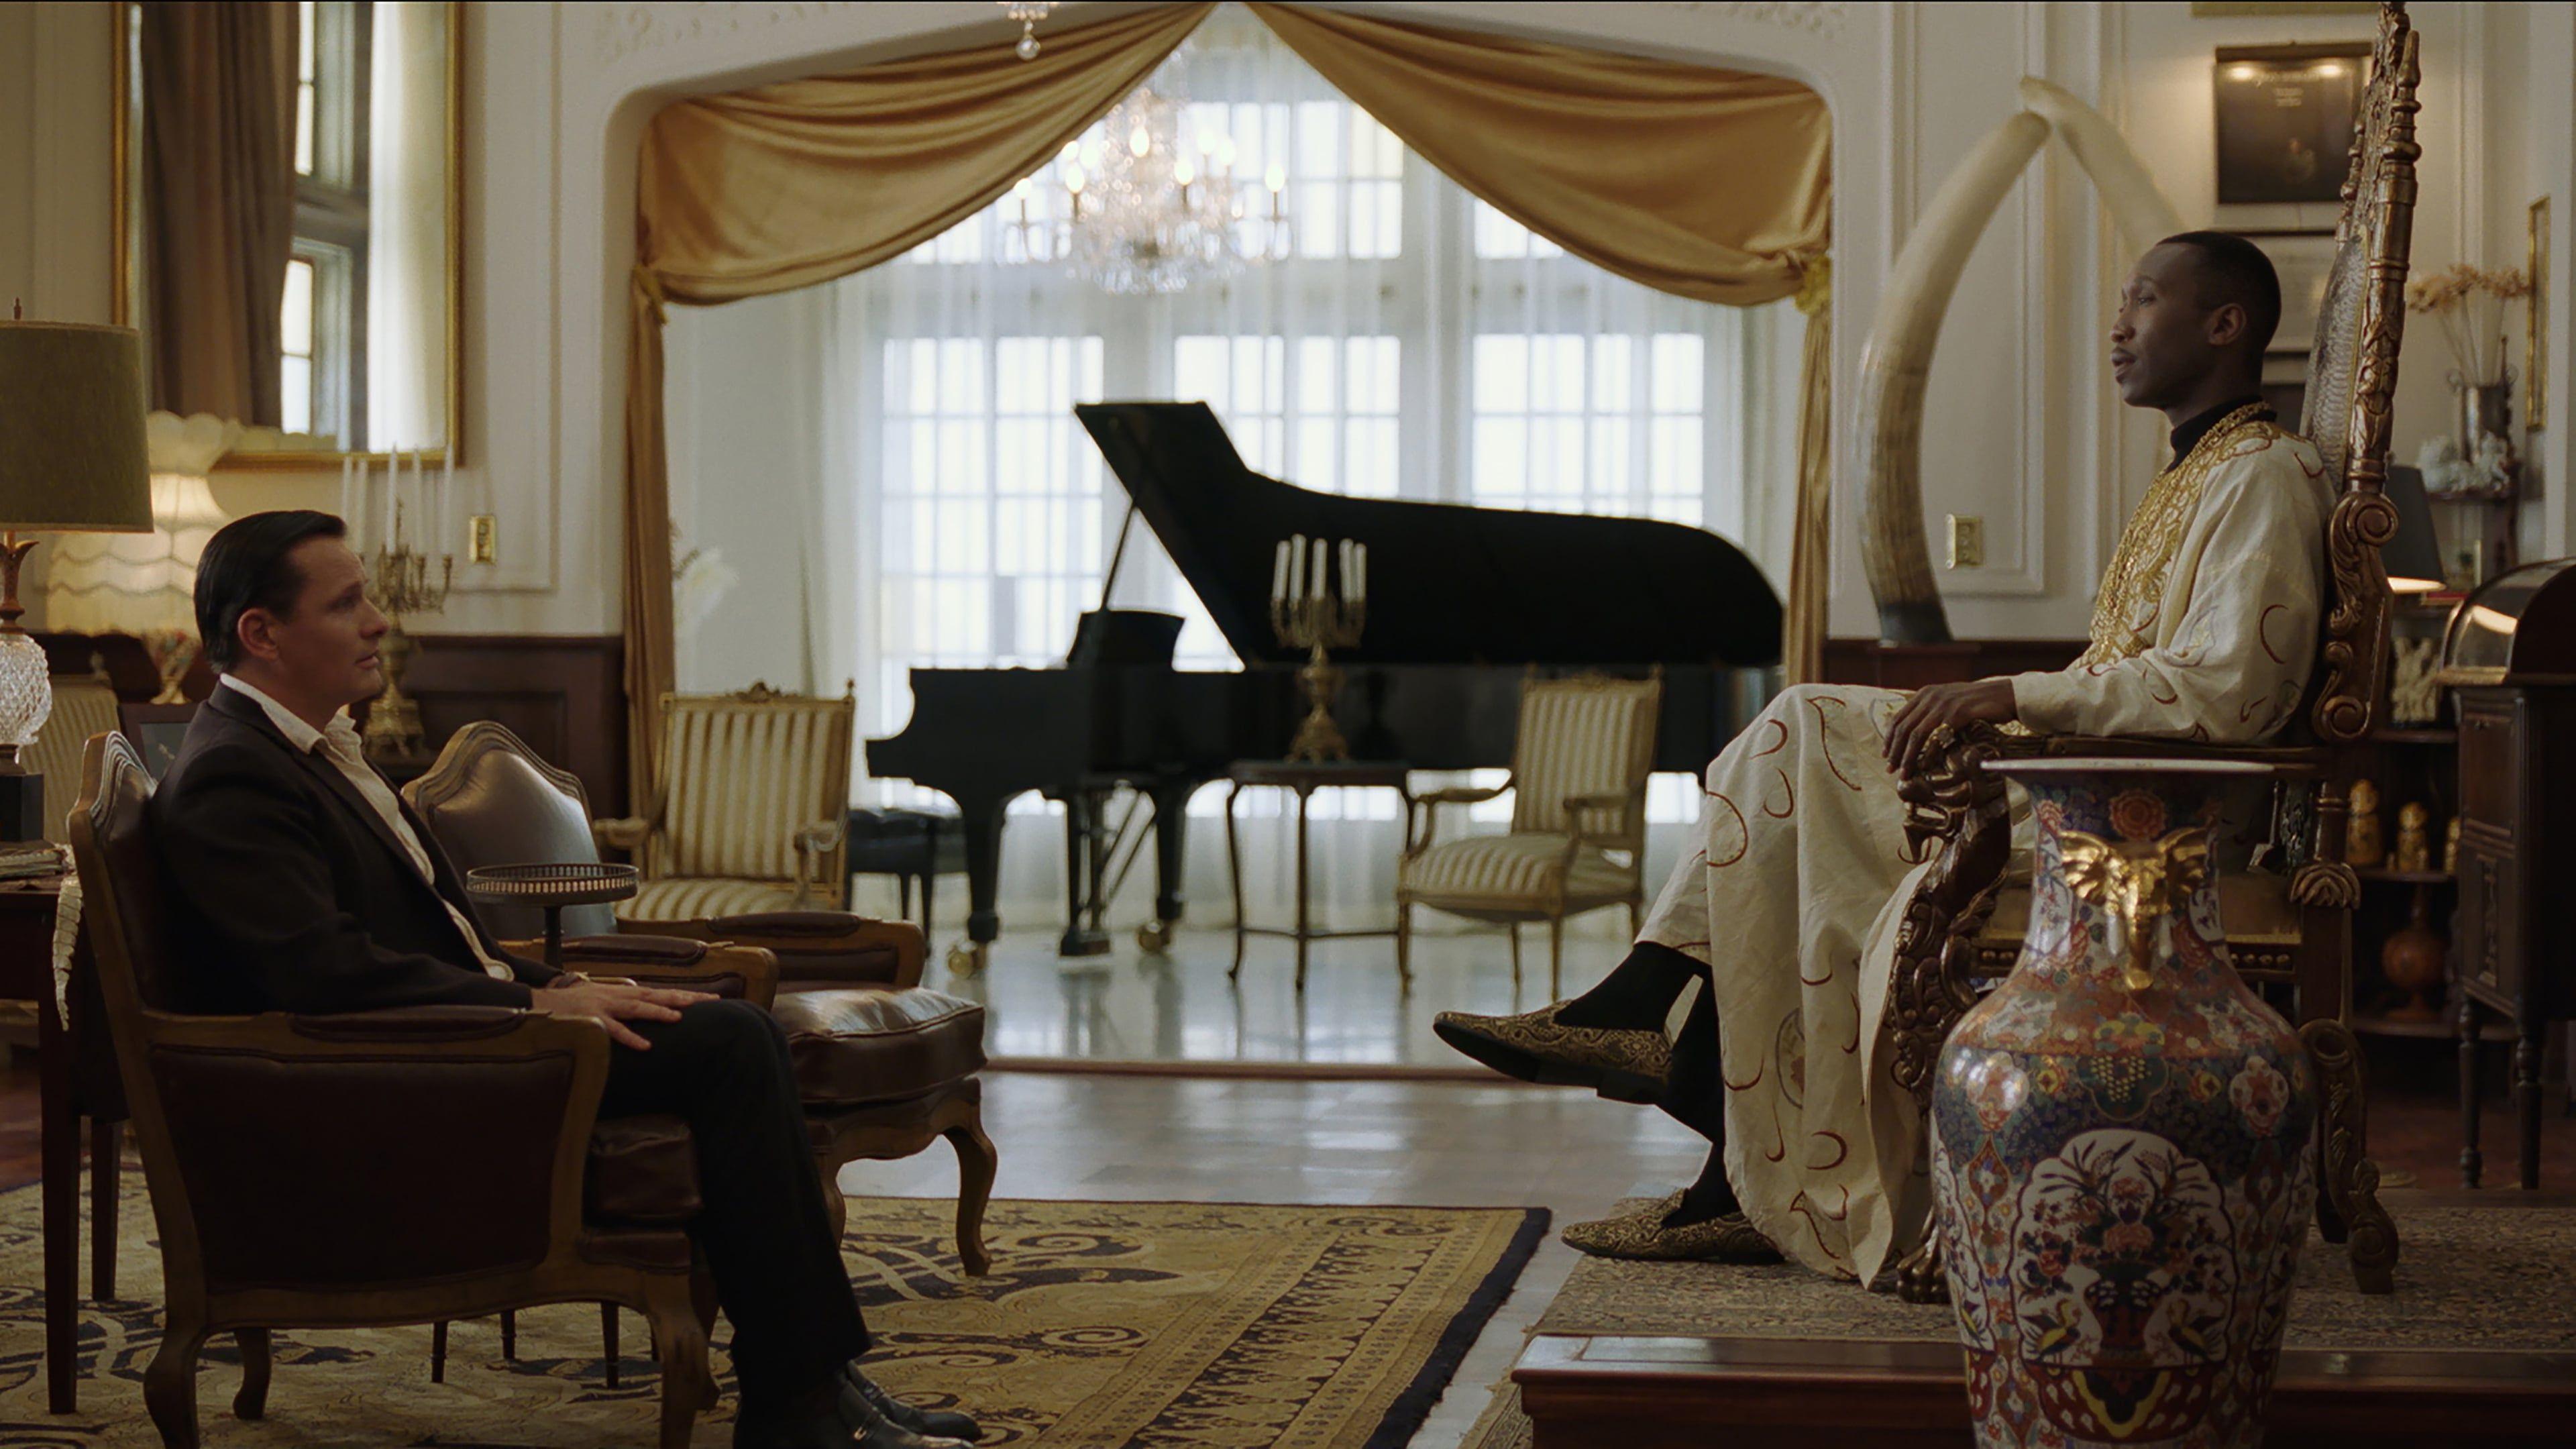 Anos 60 Cuando Tony Lip Viggo Mortensen Un Rudo Italoamericano Del Bronx Es Contratado Como Chofer Del Virtuoso Pianista Green Books Movies Online Movies